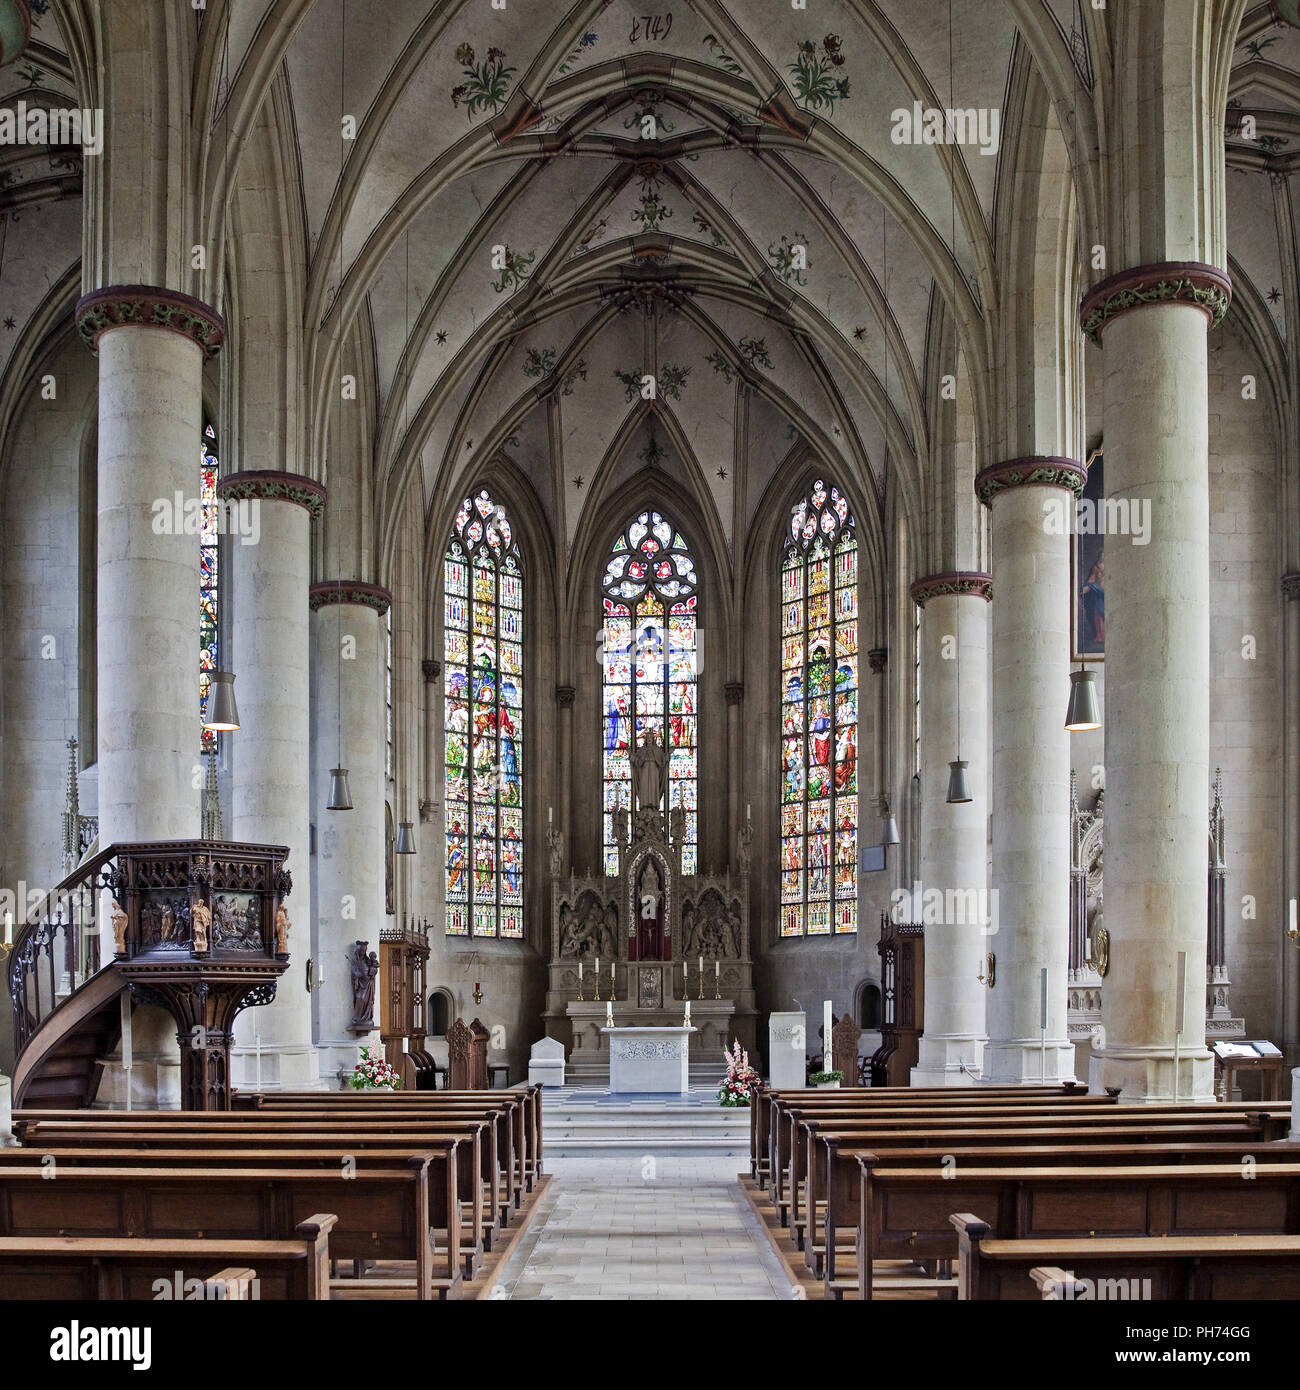 Interior, parish church, Nottuln, Germany - Stock Image